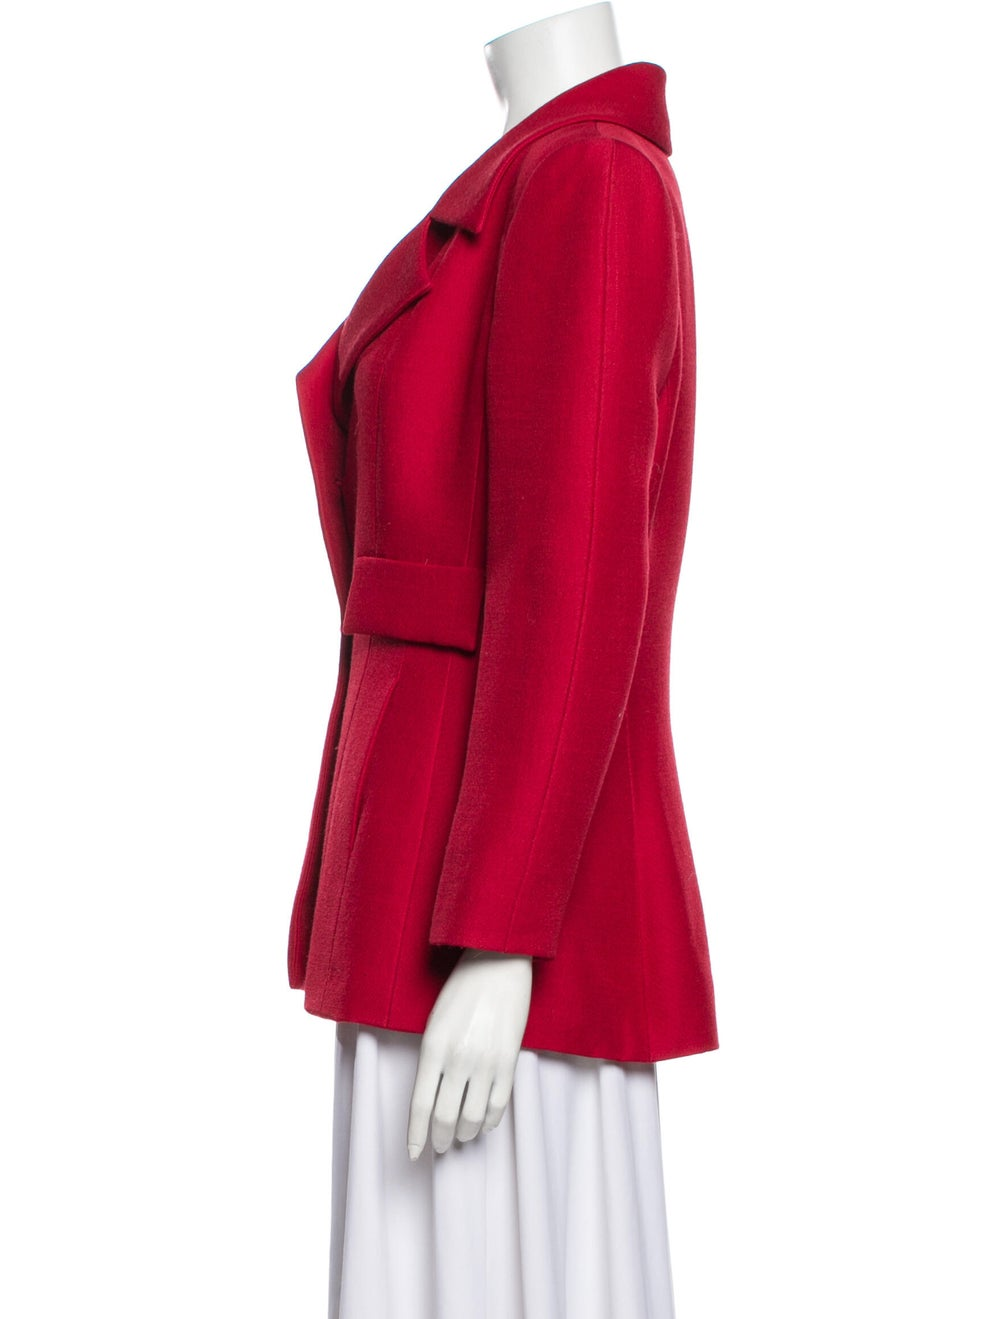 Chanel Vintage 2001 Blazer Wool - image 2